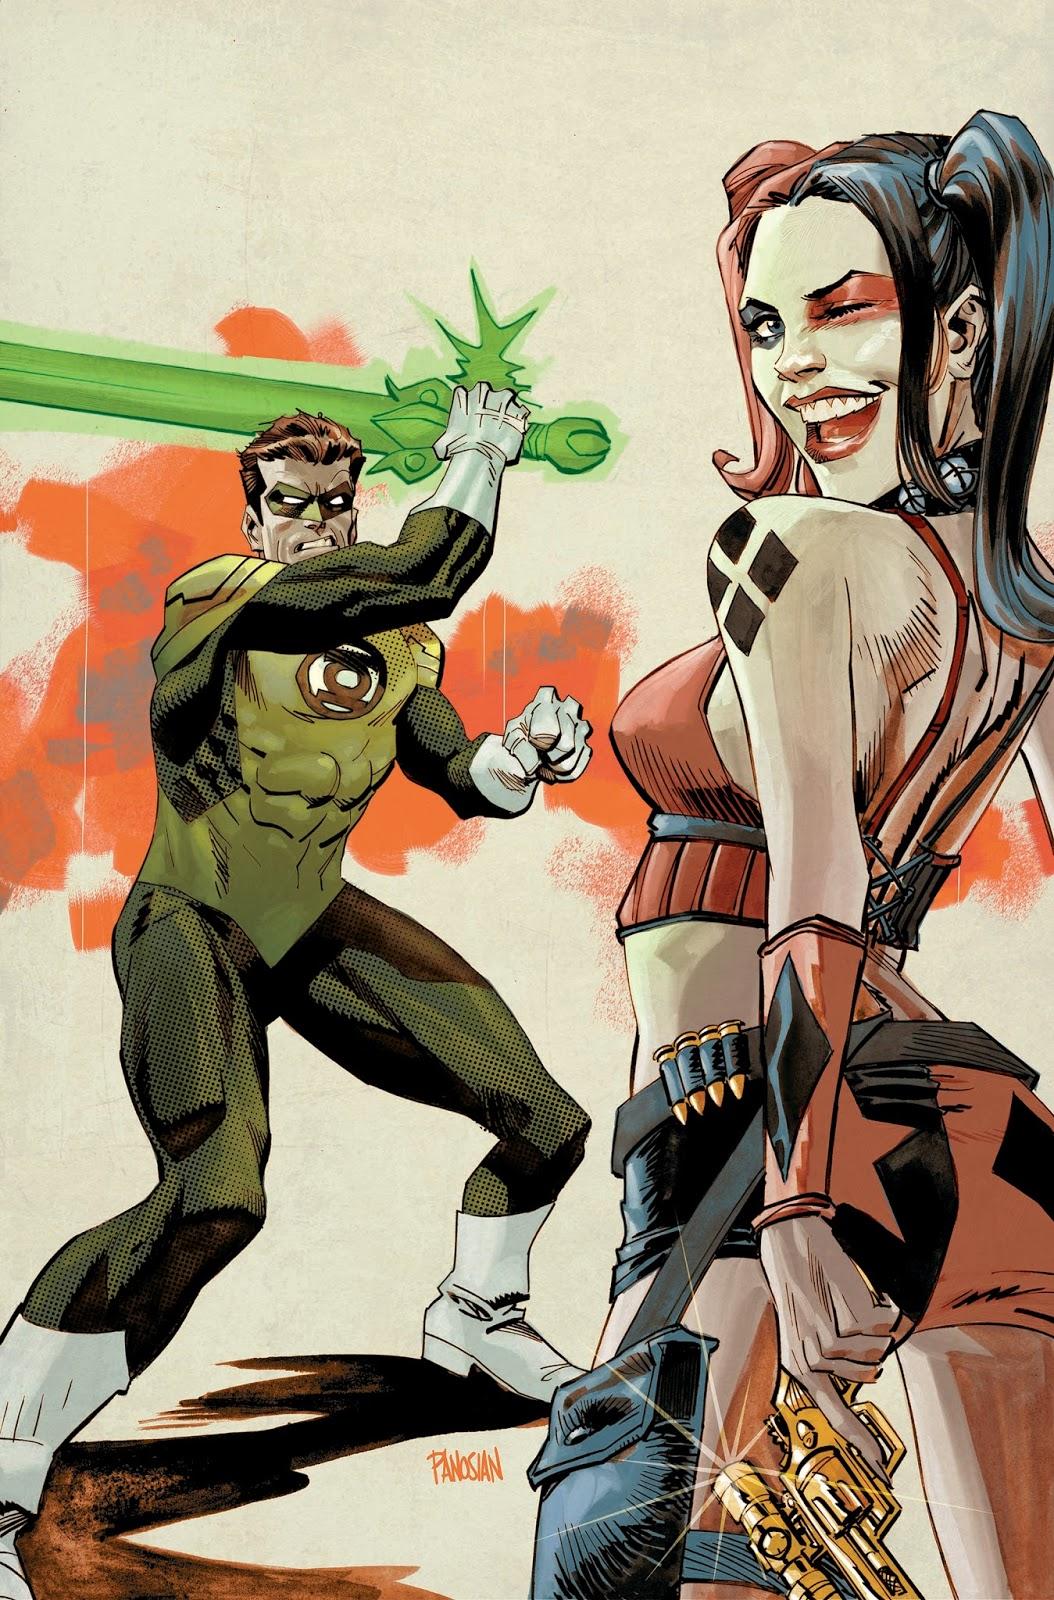 Harley Quinn Vol 2 20 Textless Green Lantern 75th Anniversary Variant.jpg